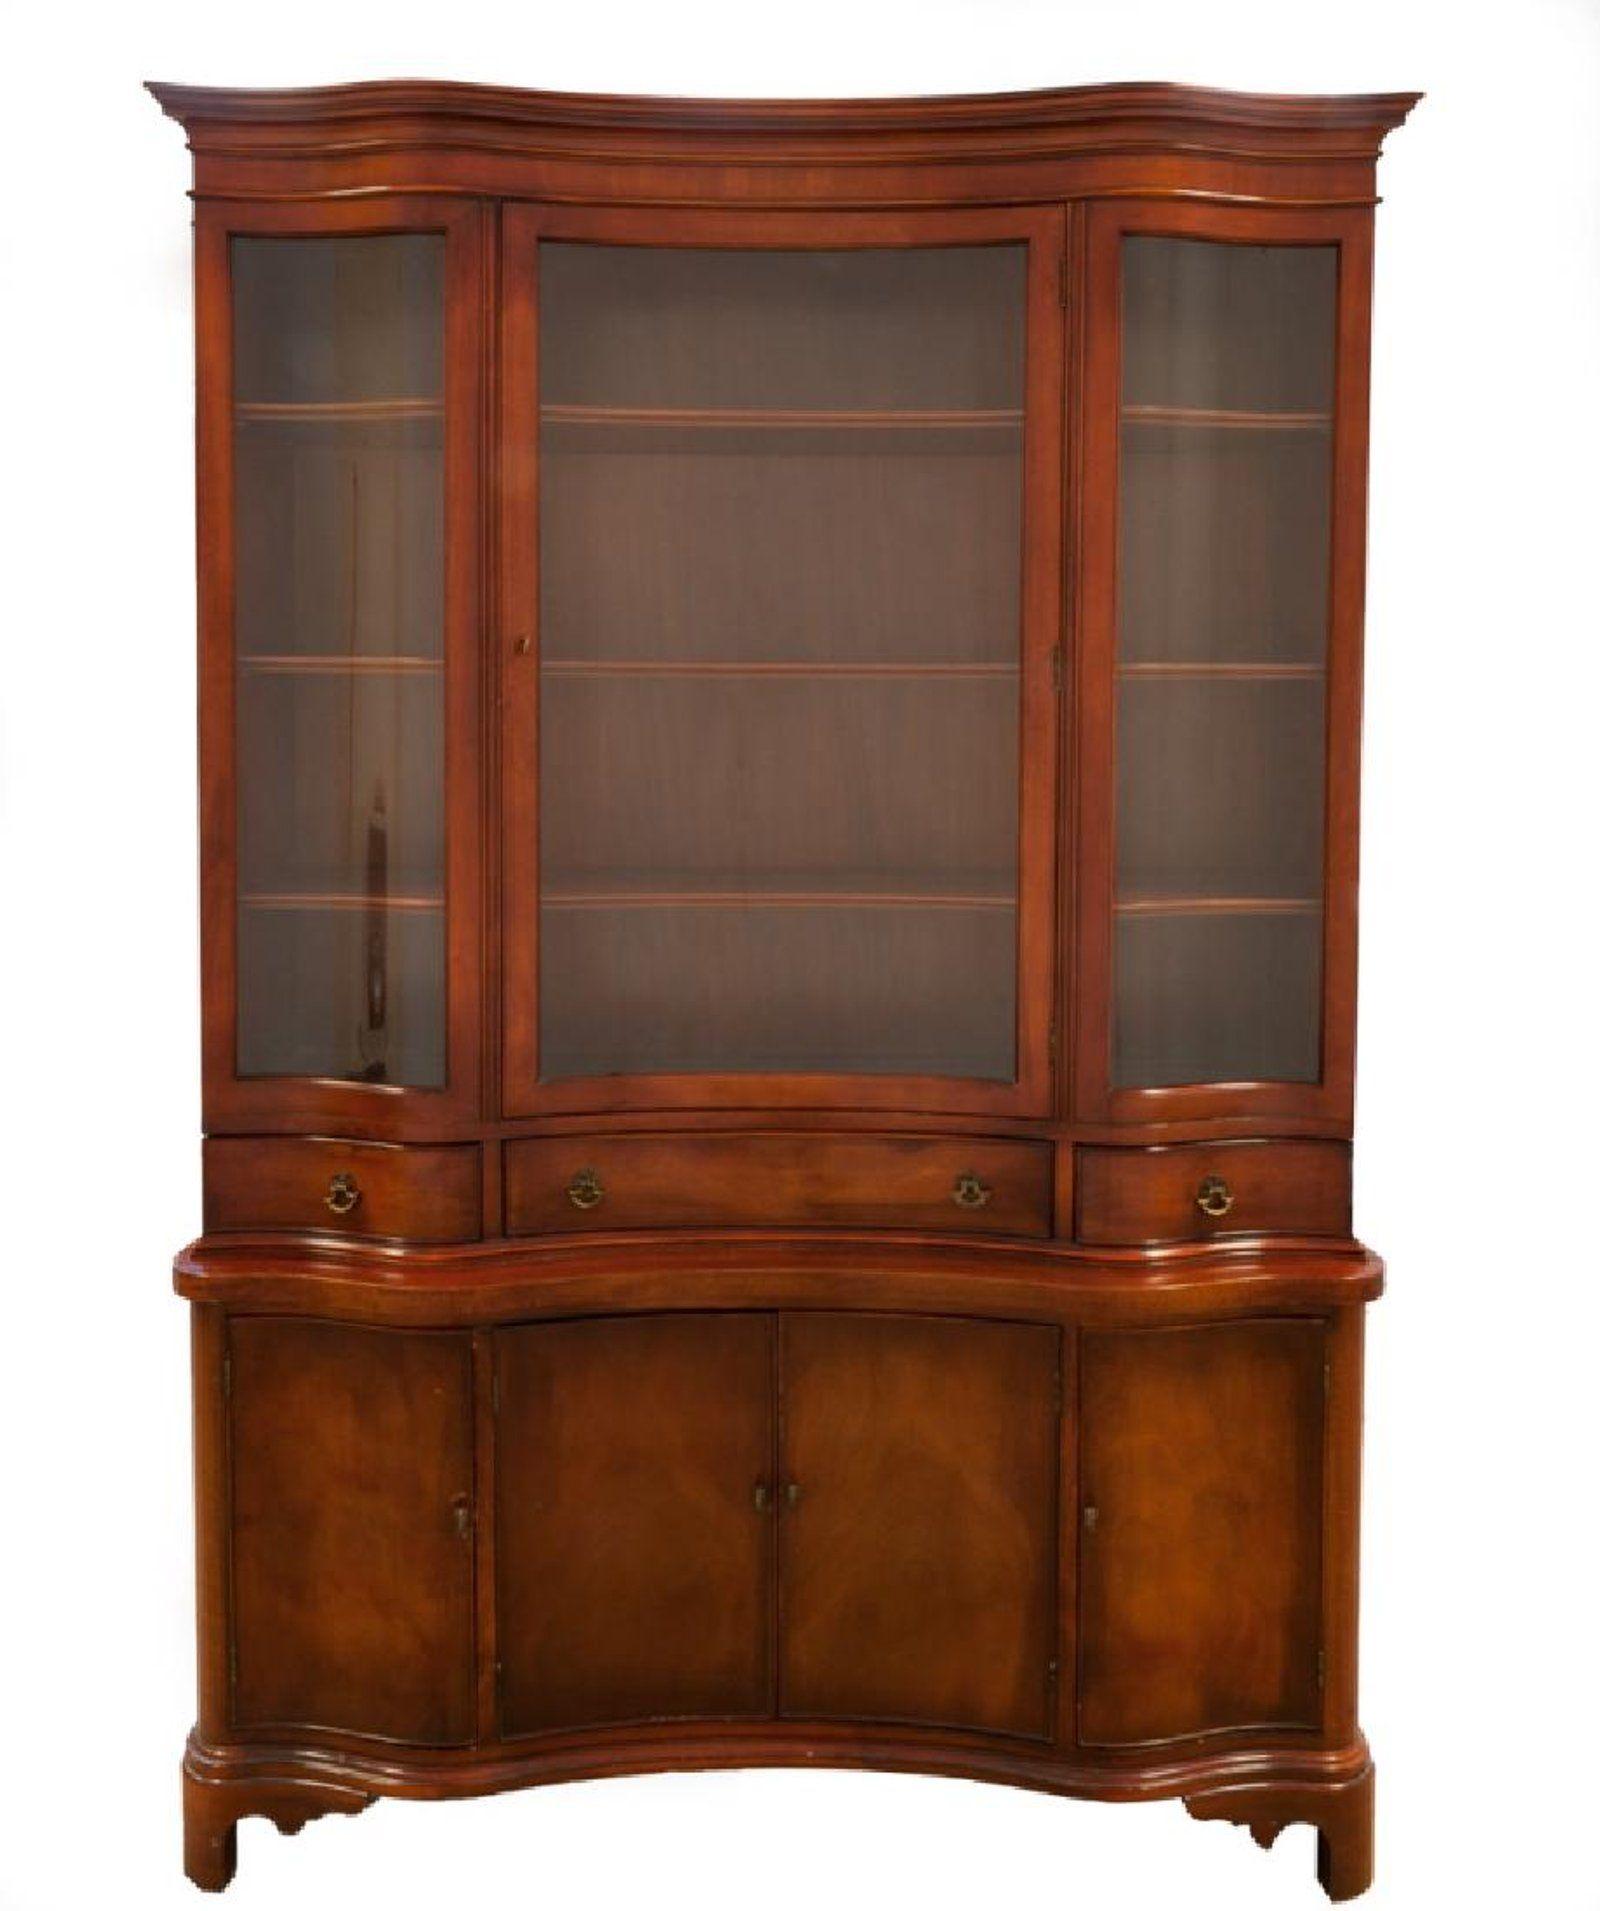 Morganton Furniture Serpentine Front China Cabinet